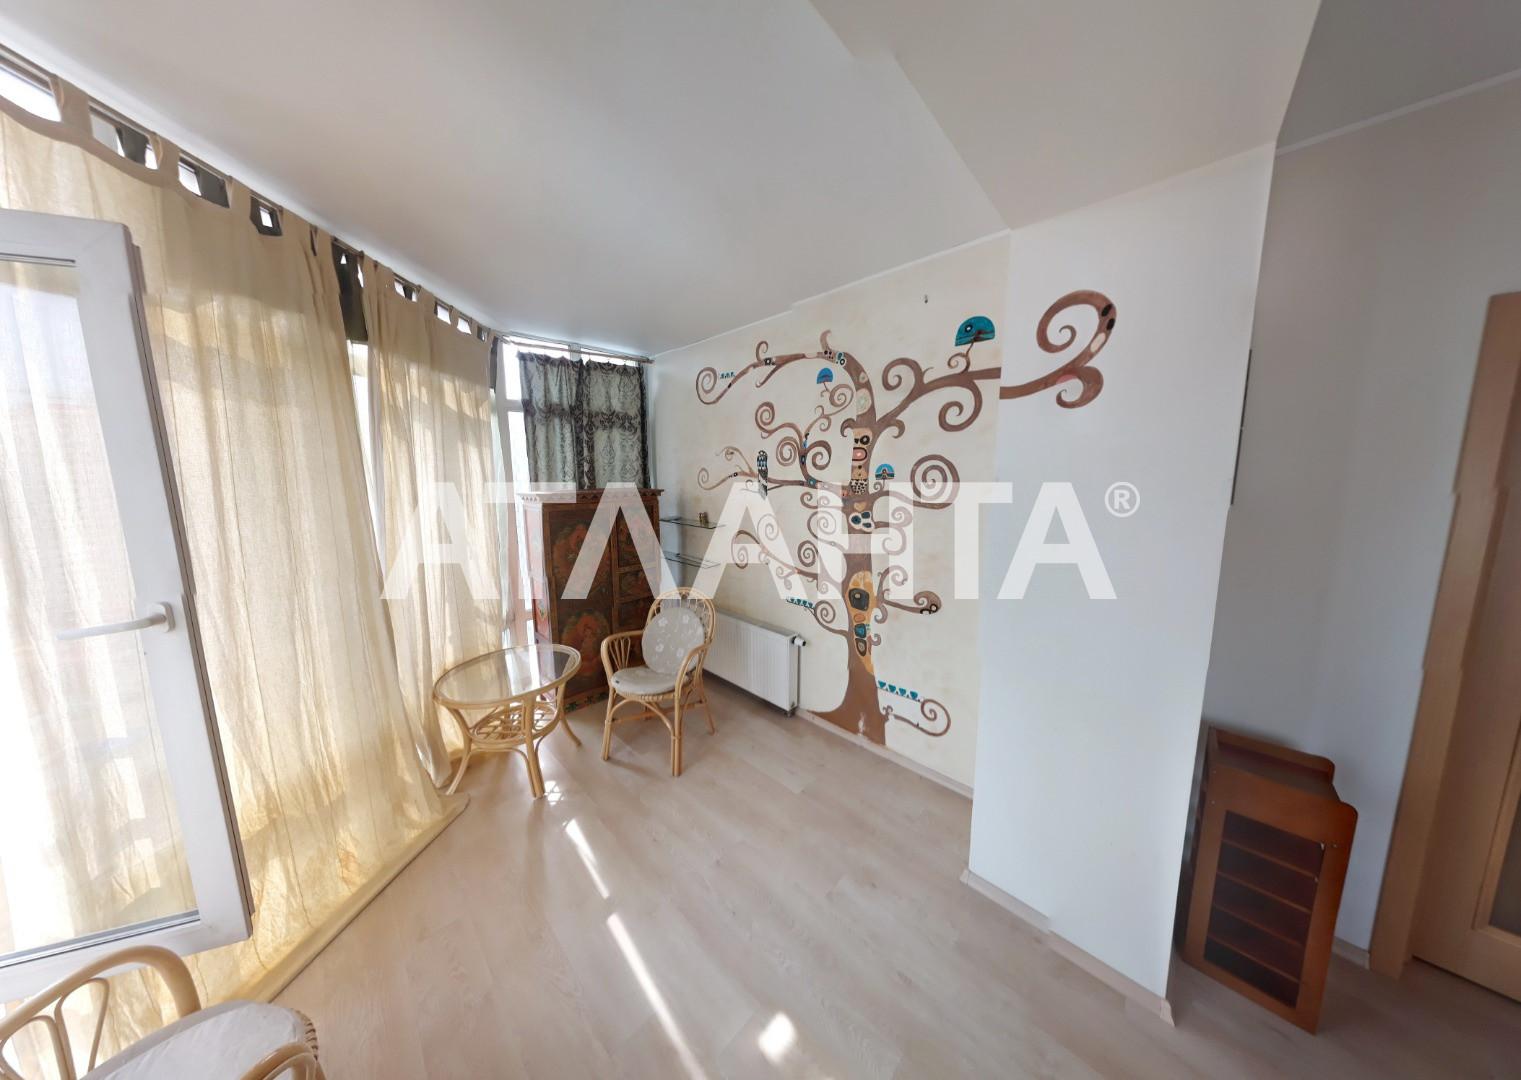 Продается 3-комнатная Квартира на ул. Ломоносова — 118 900 у.е. (фото №17)